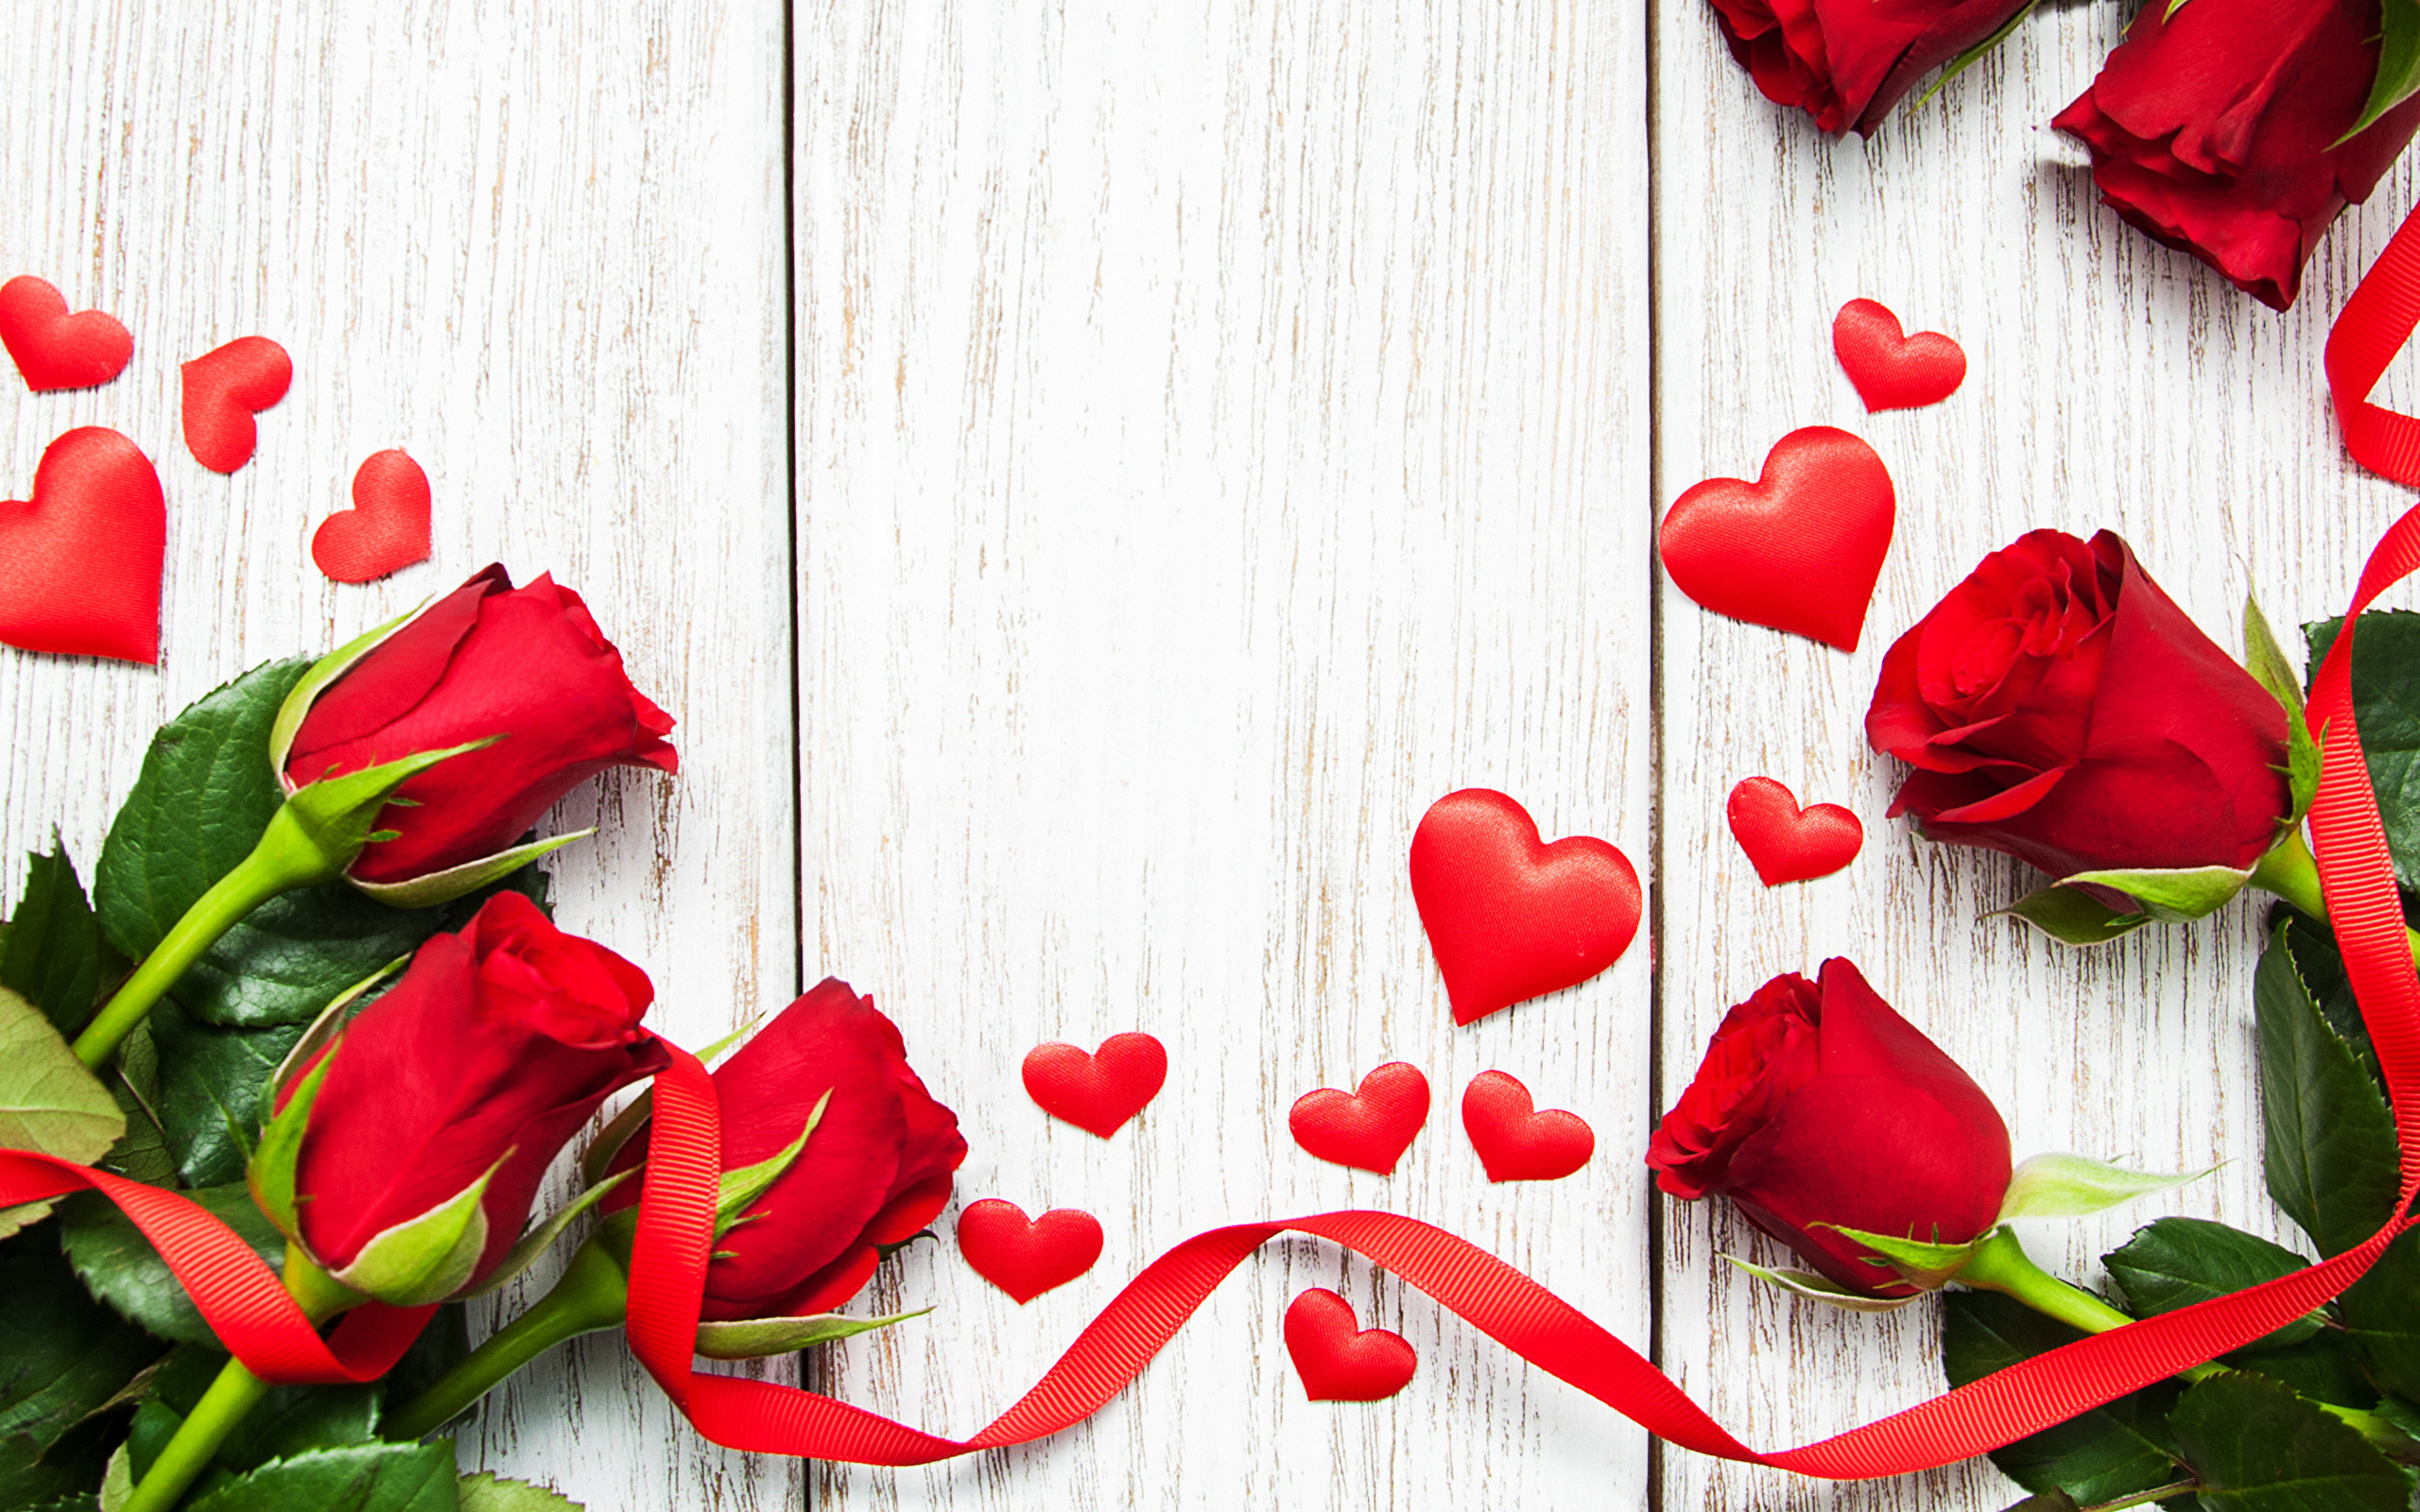 Supreme Girl Iphone Wallpaper Red Rose Heart Wallpaper 53 Images